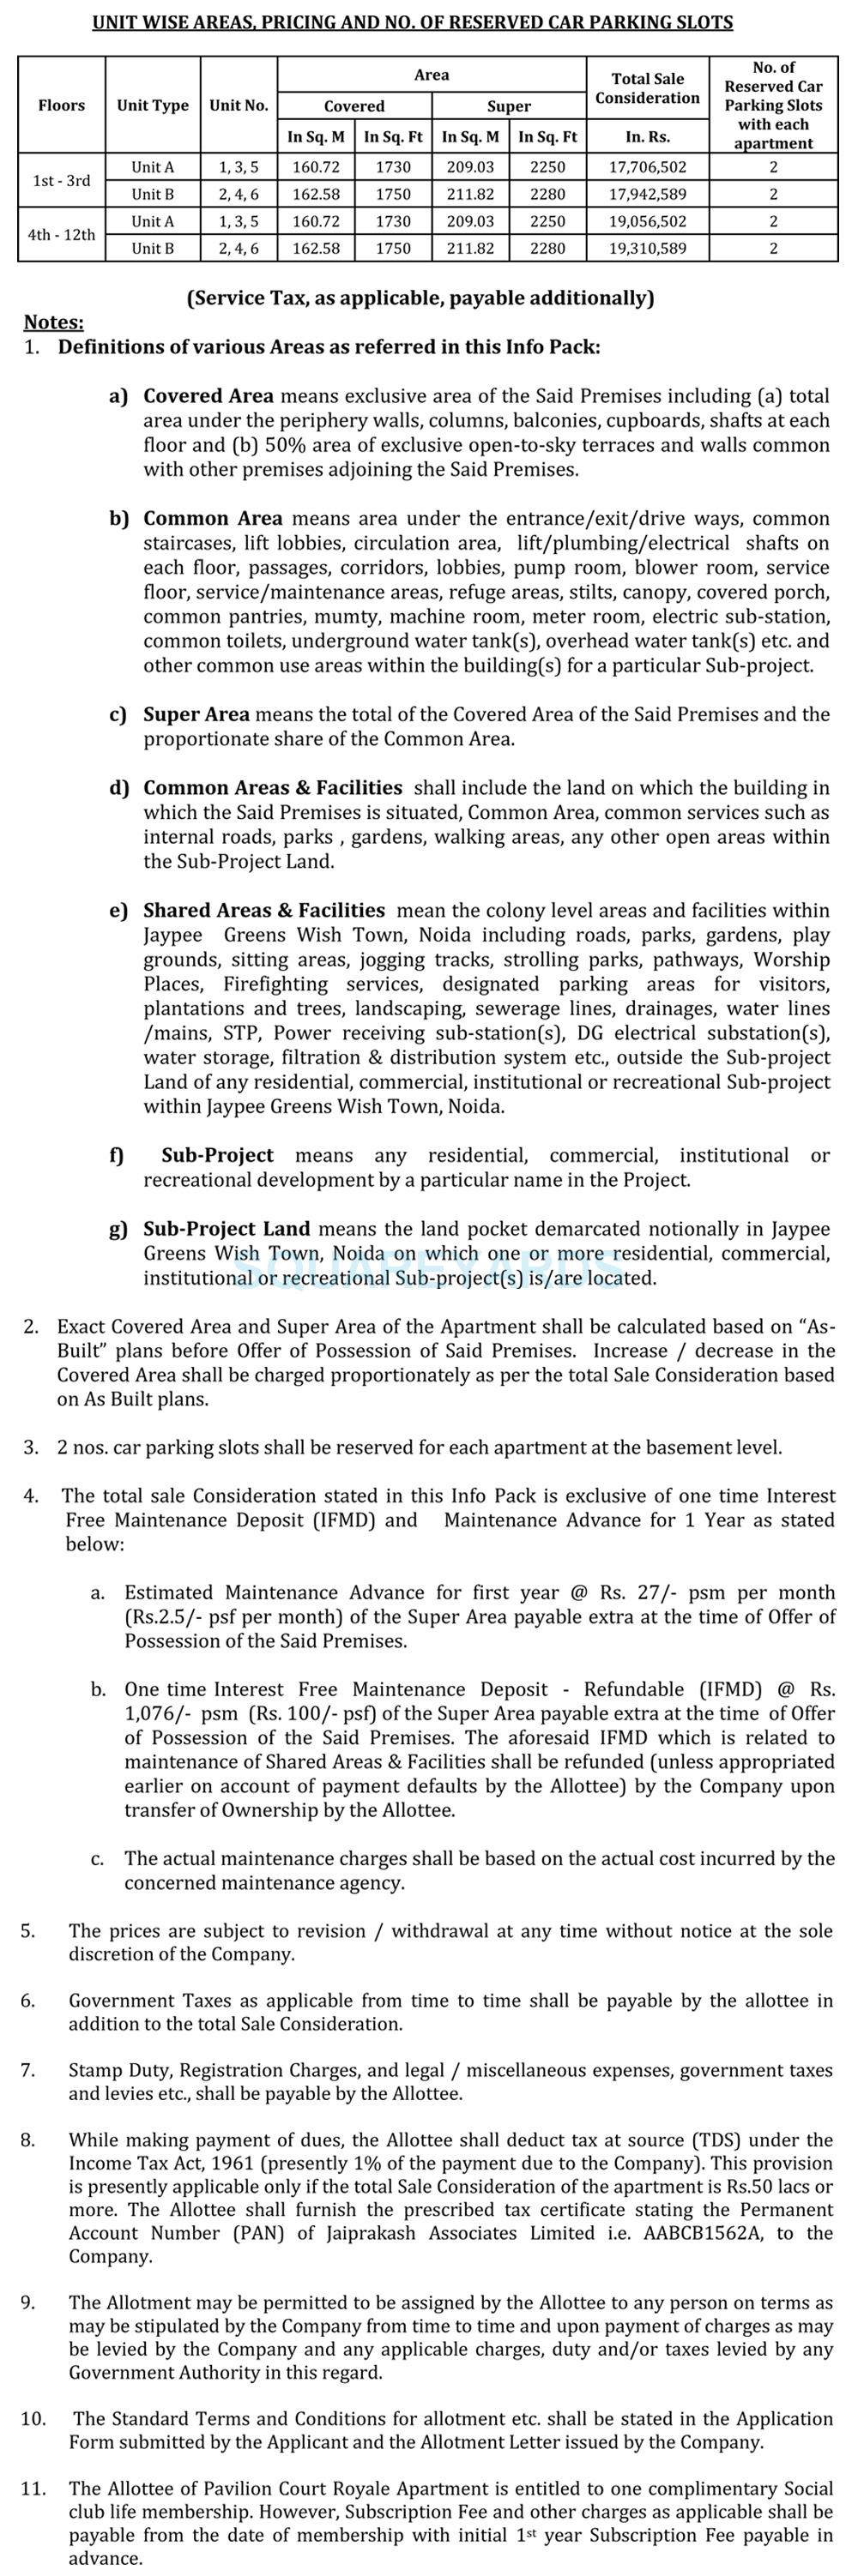 jaypee pavilion court royale payment plan image2